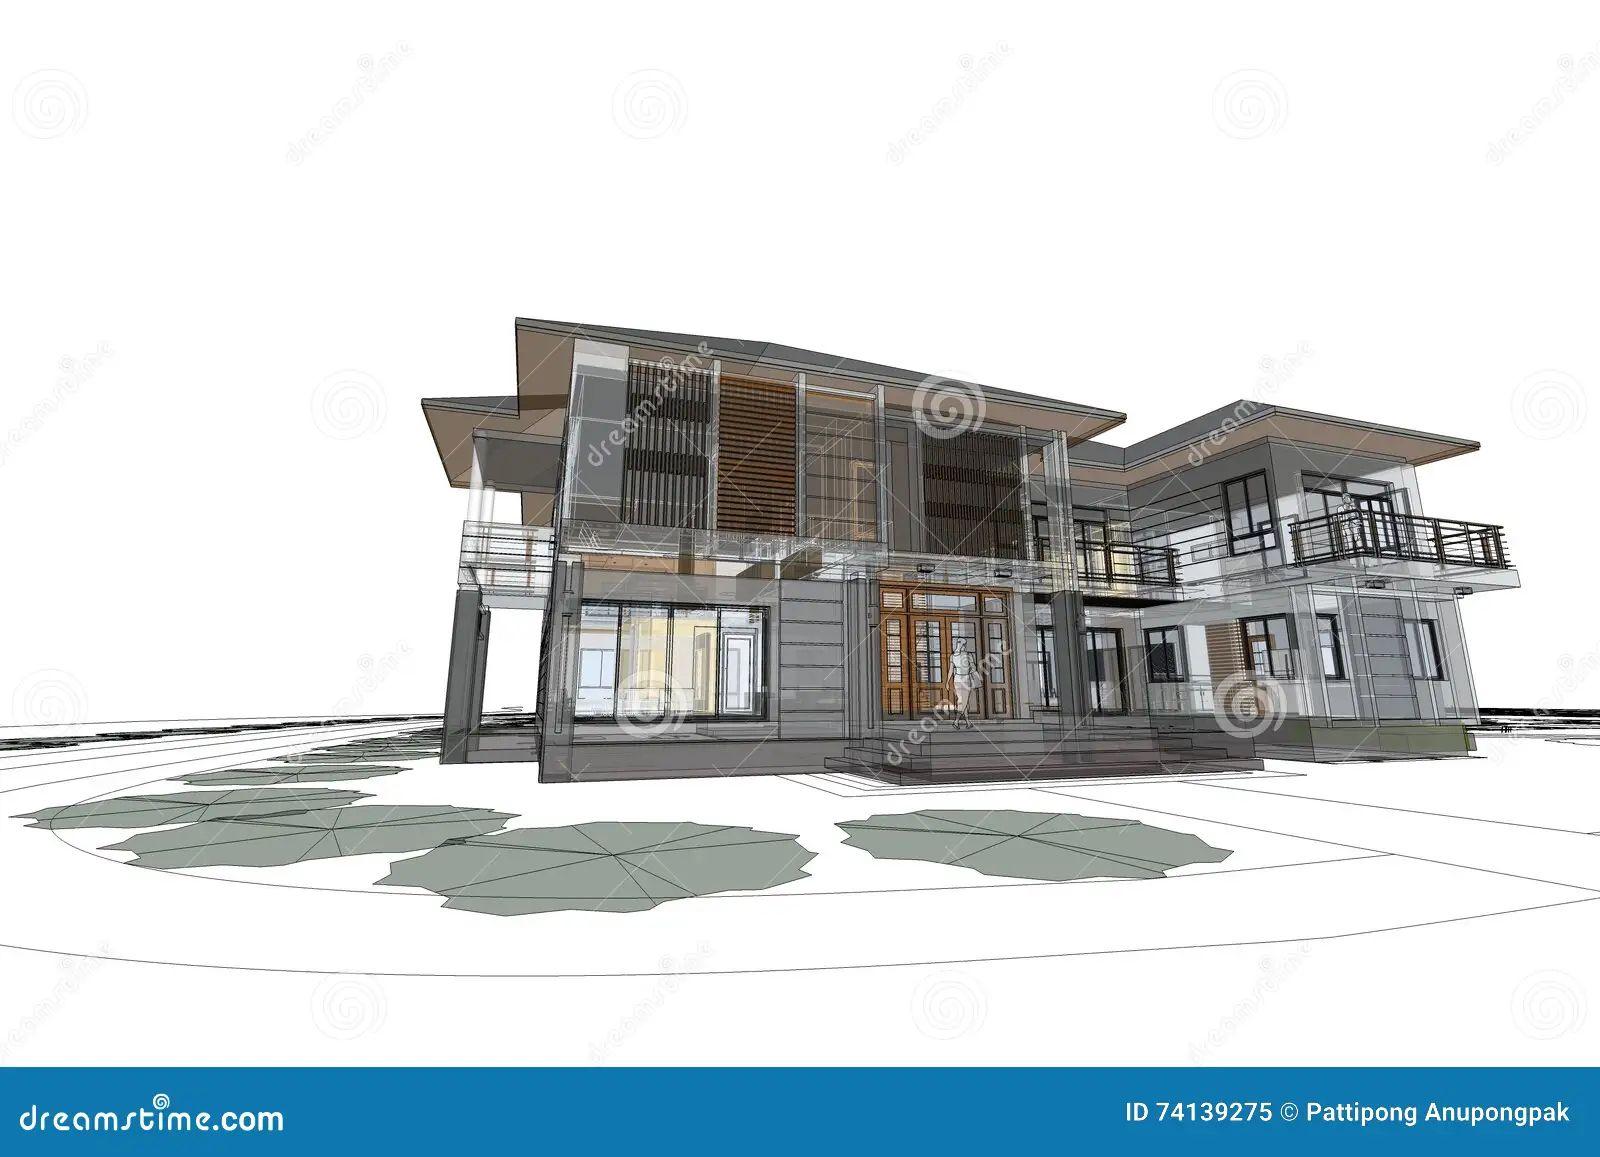 Beautiful architecture moderne maison dessin gallery - Dessin interieur maison ...